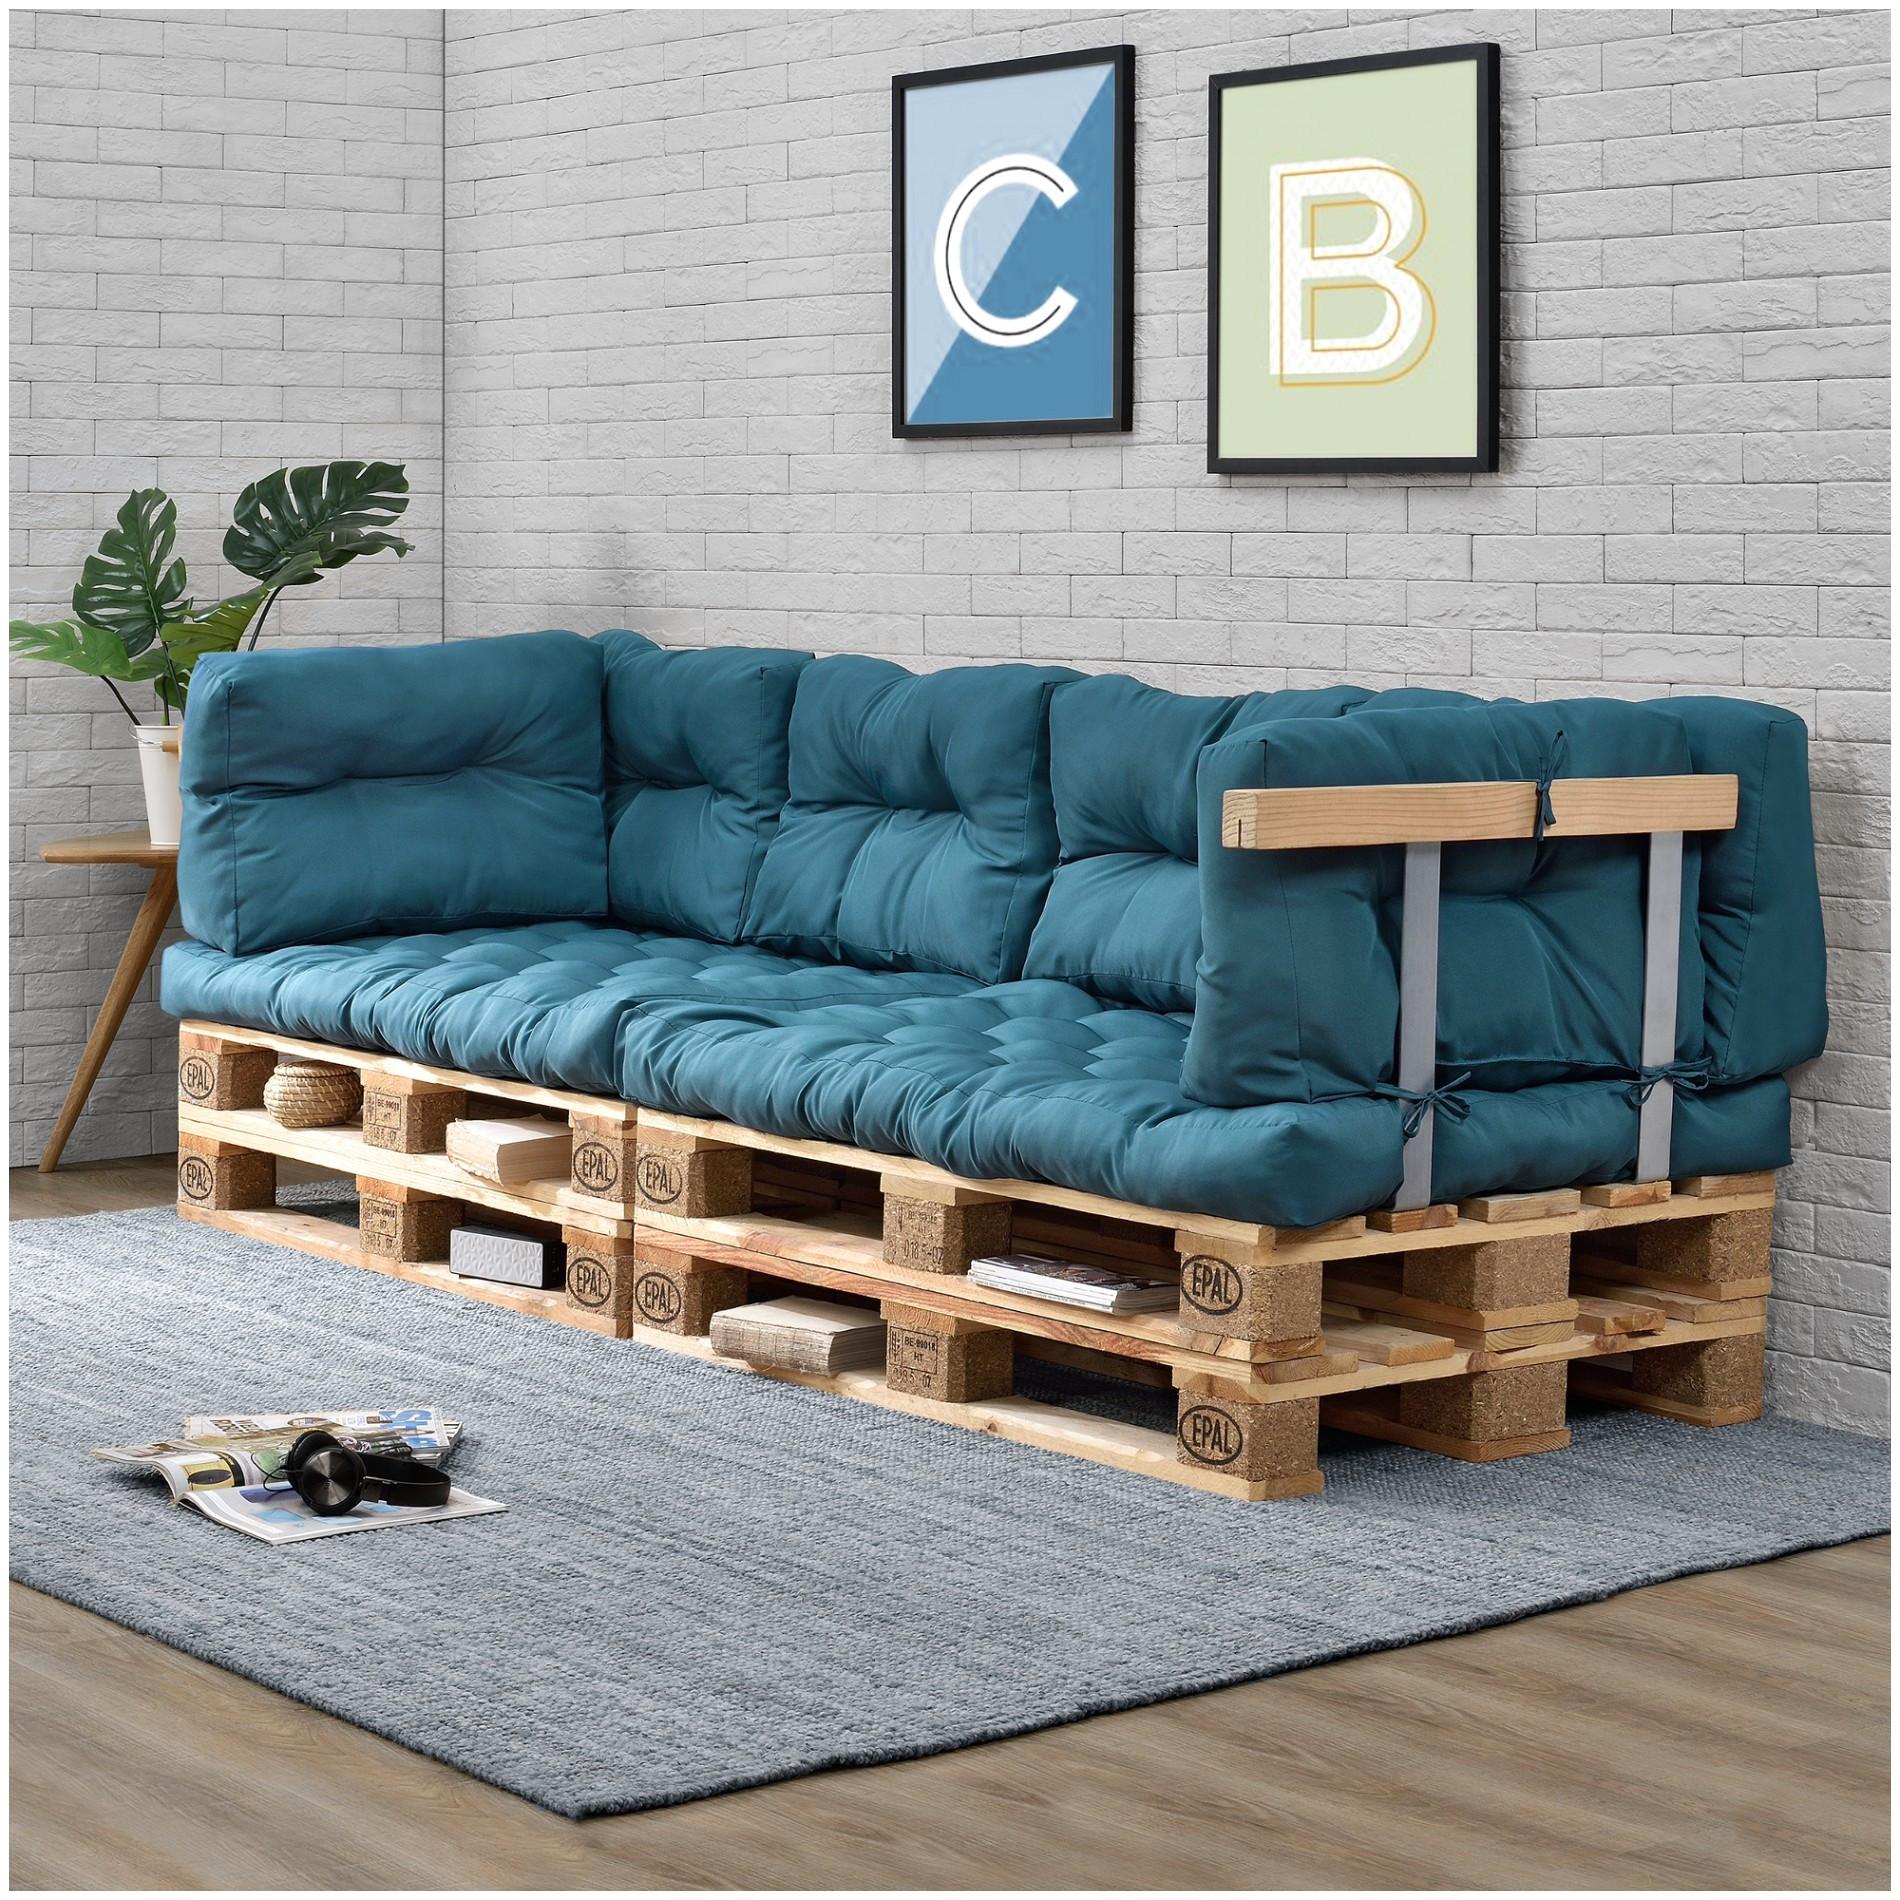 Replacement Cushions for This End Up sofa 3er Schlafsofa Luxus sofas 3 Sitzer Xl sofas sofa Xl sofa Xl sofa 0d